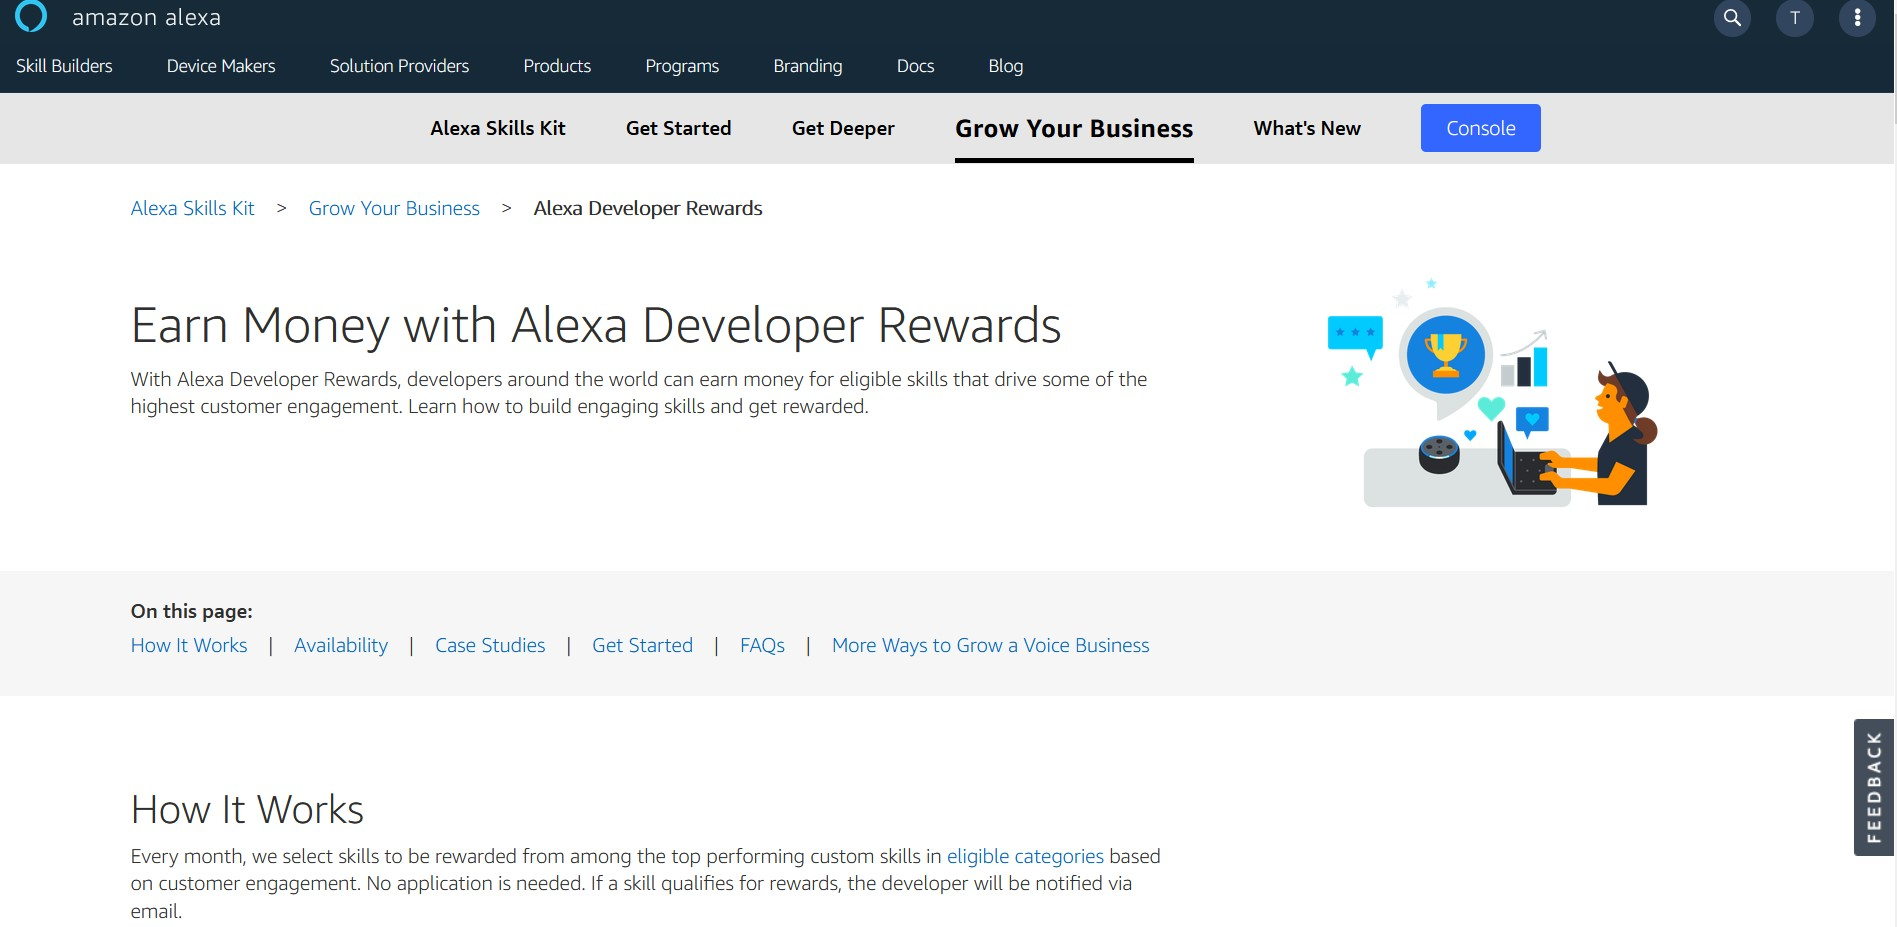 Gagner de l'argent avec Amazon Alexa Developer Rewards